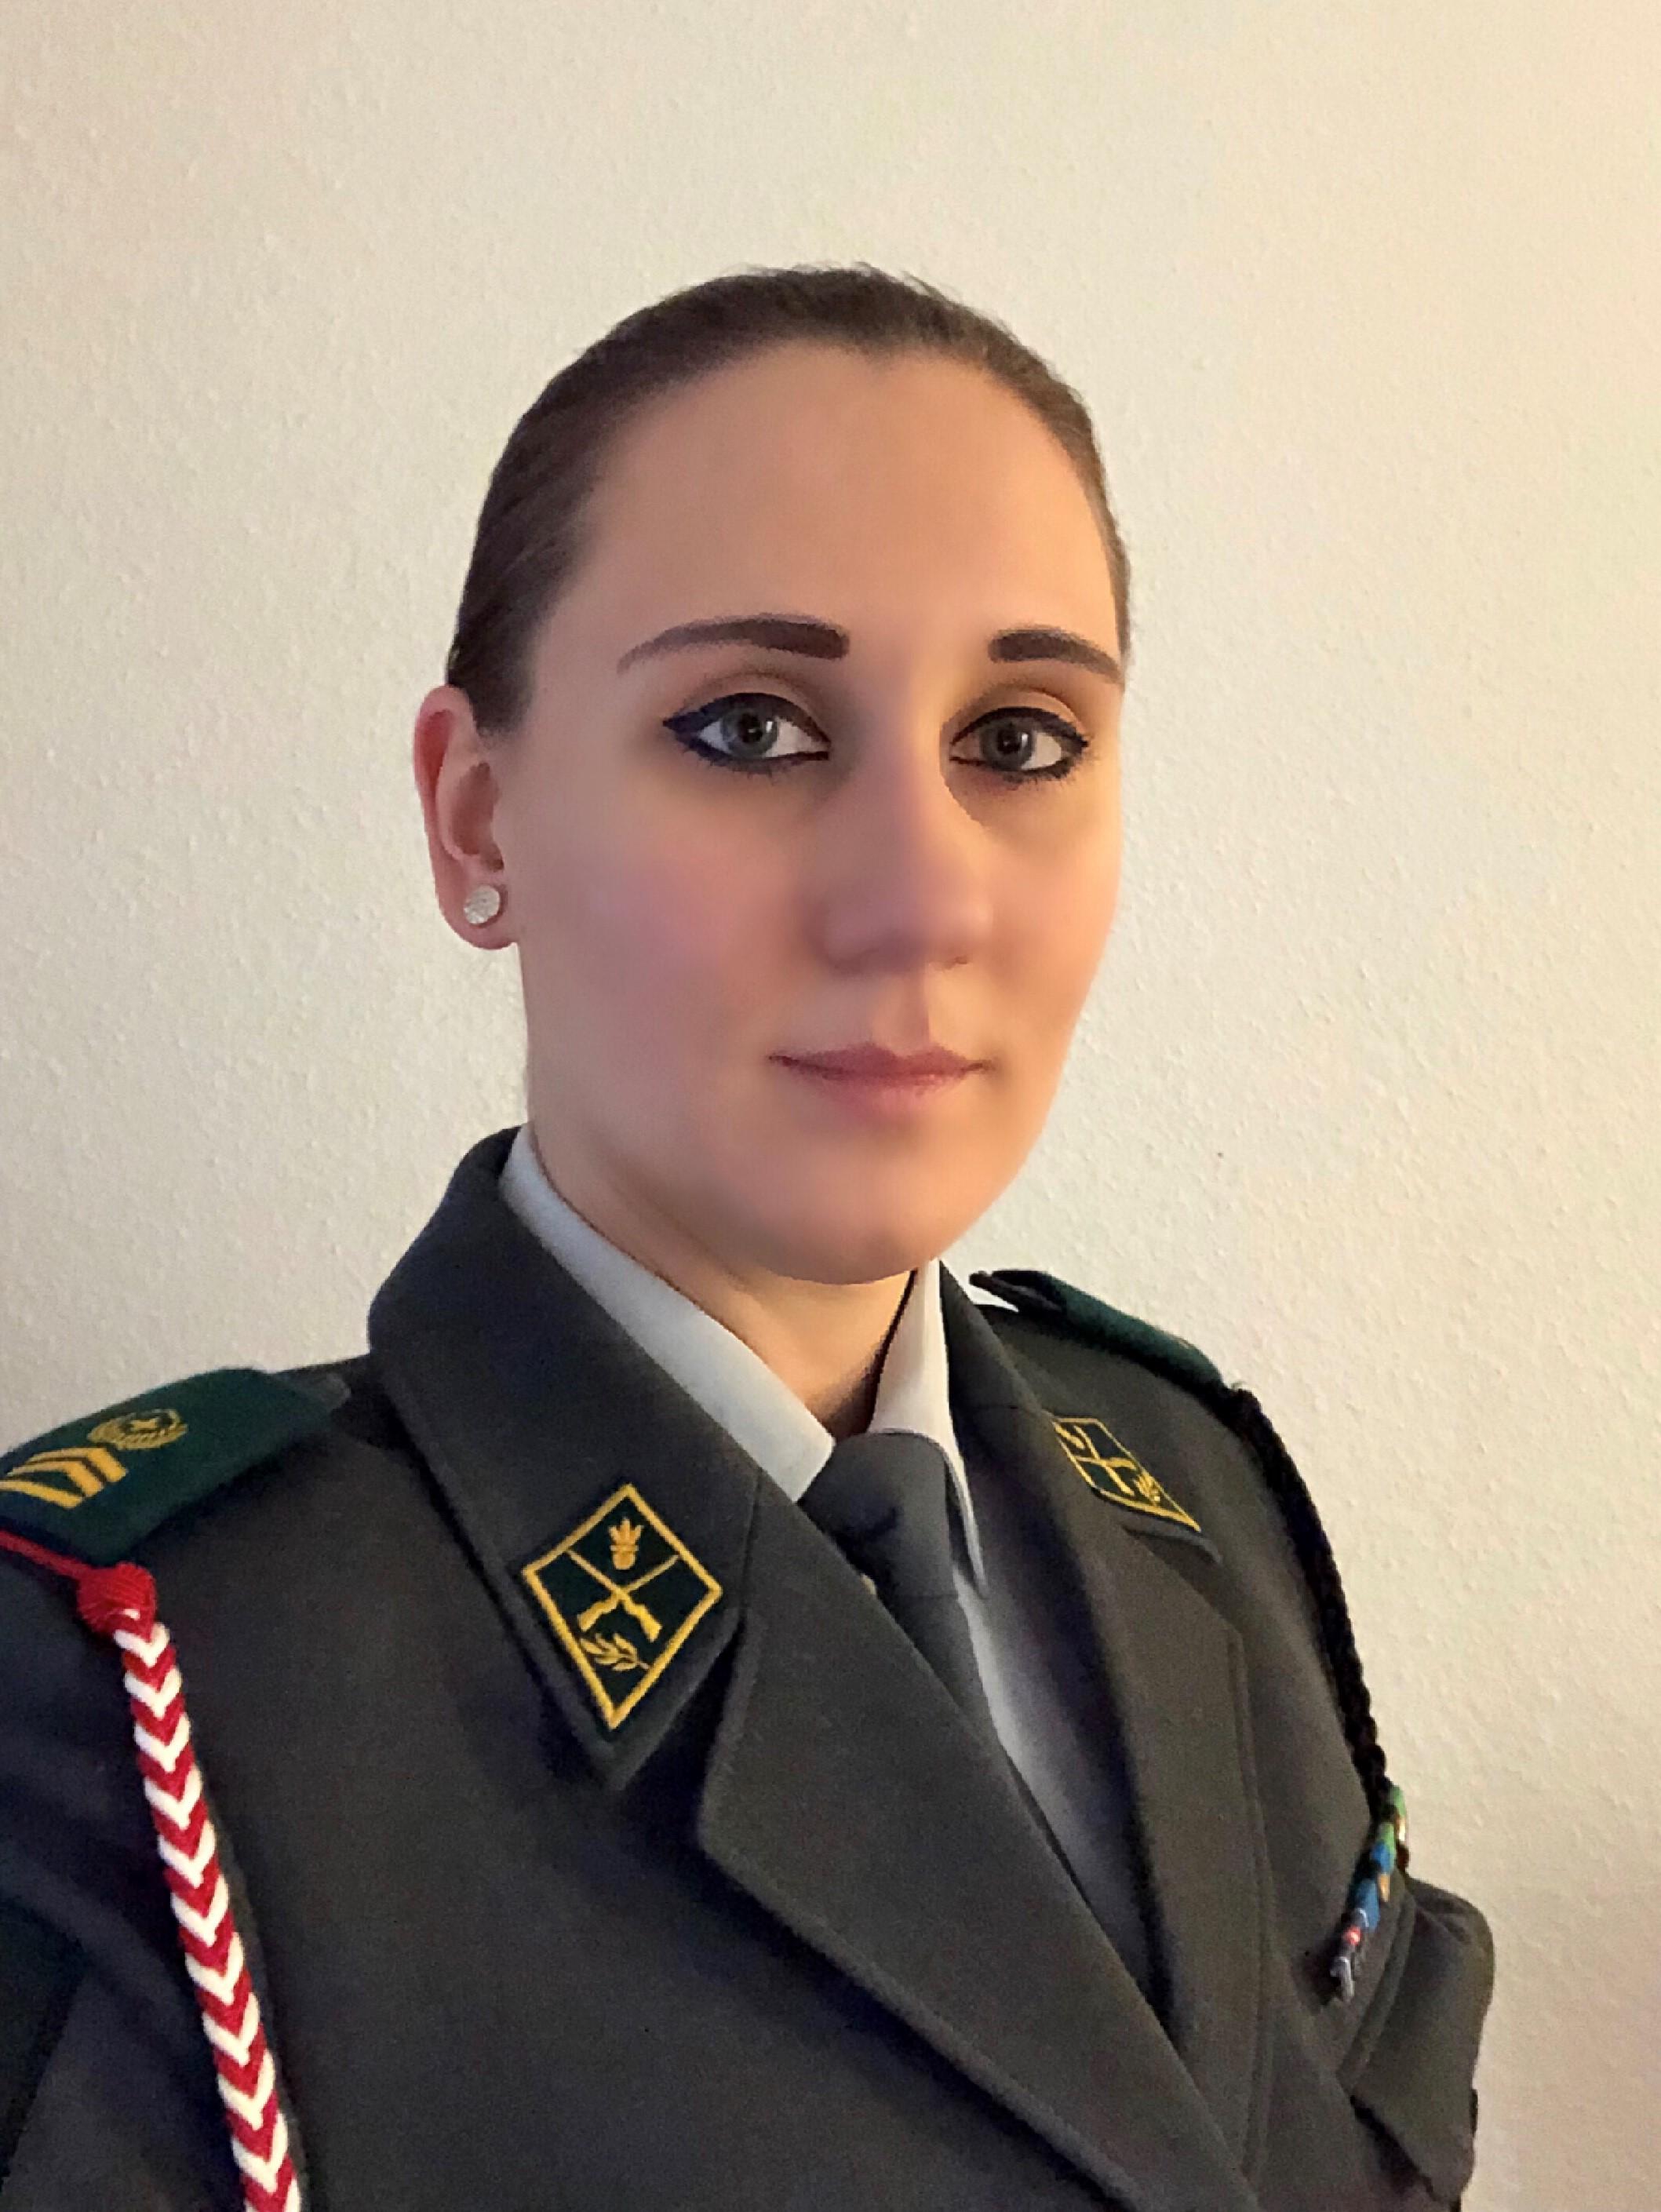 Sgtm chef Almedina OSMIC